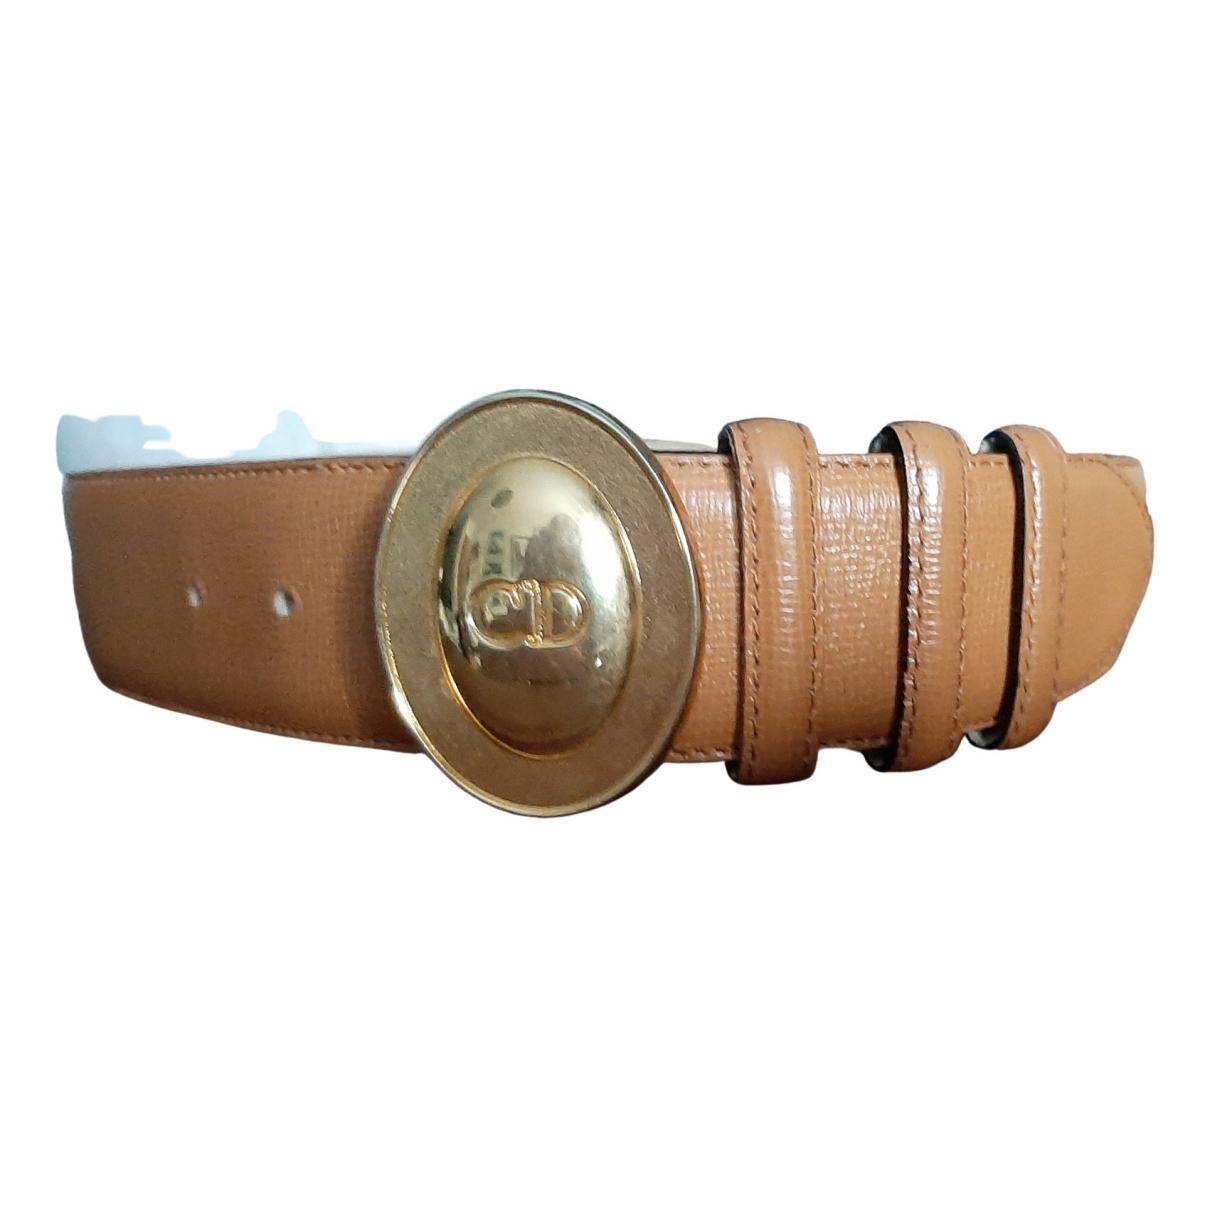 Dior \N Brown Leather belt for Women S International